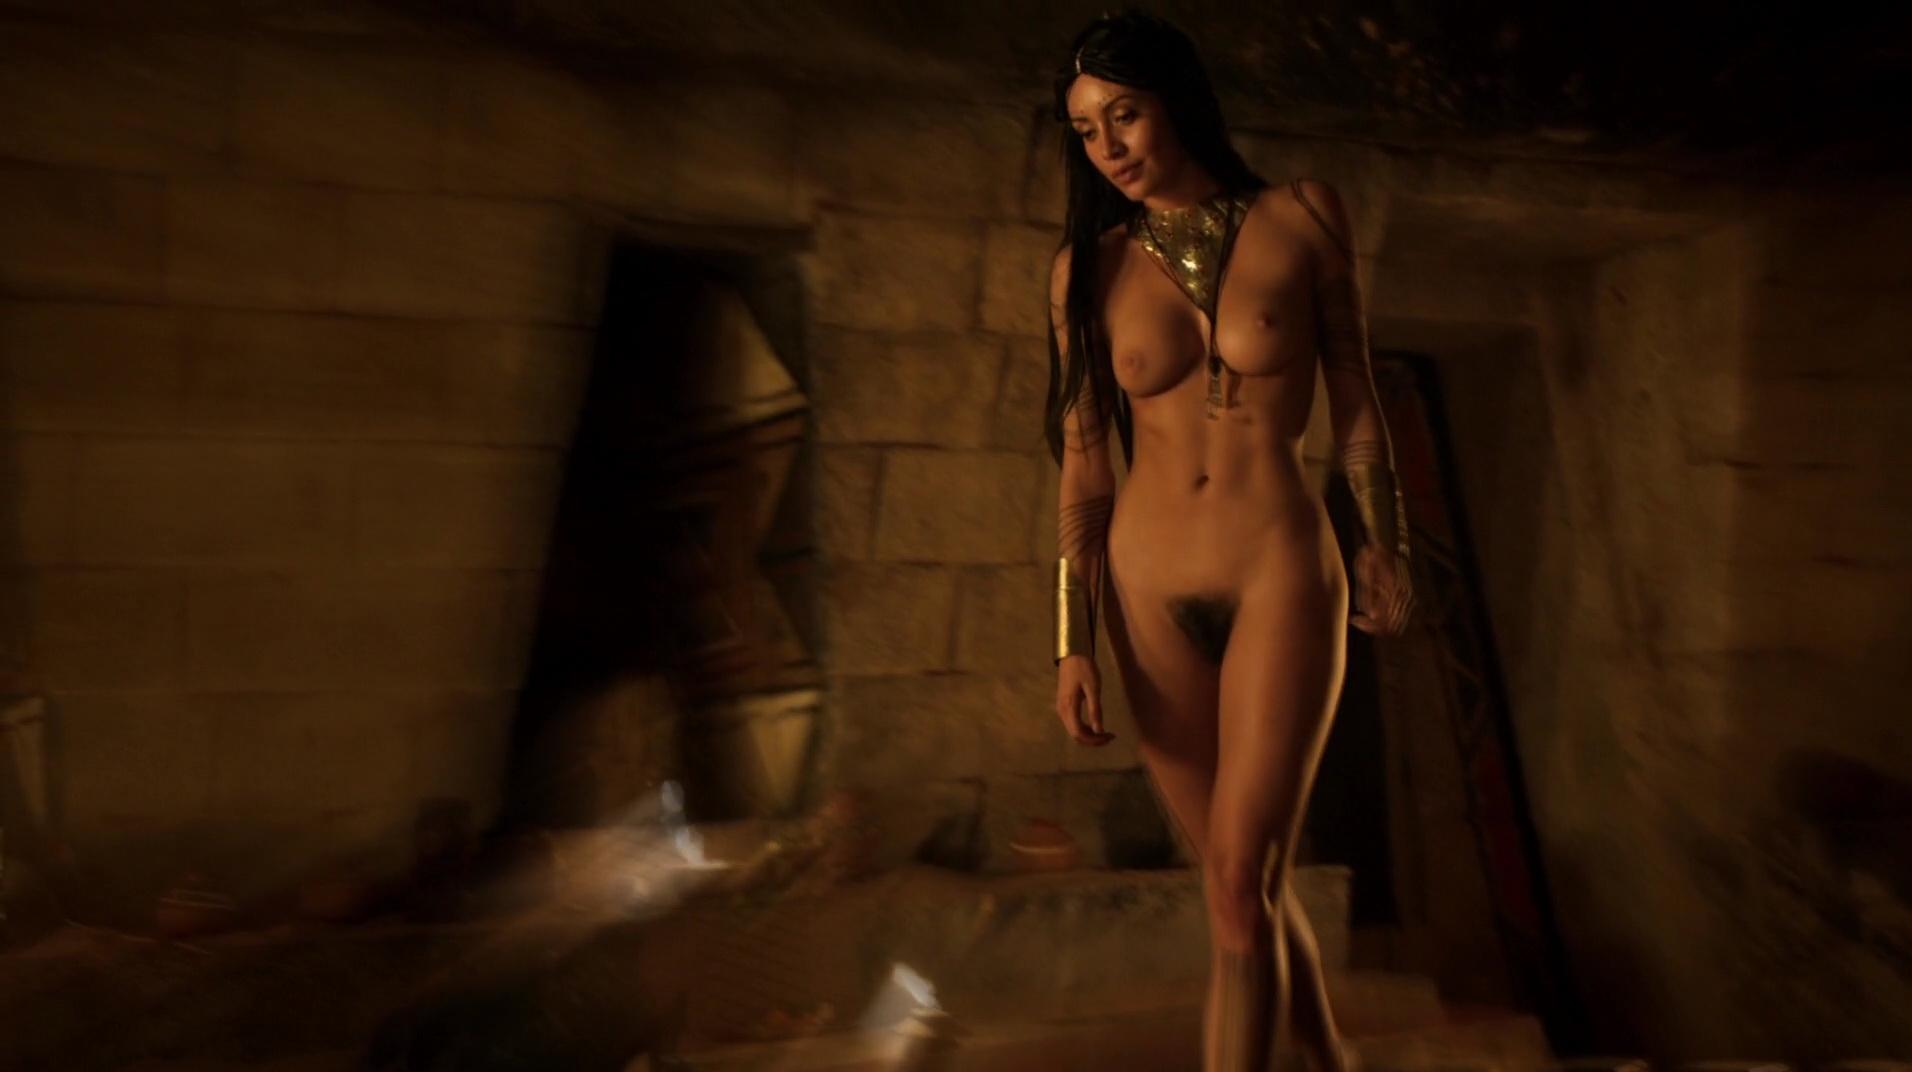 Amy Schumer Nude Scene watch online - carolina binda - loro (2018) hd 1080p